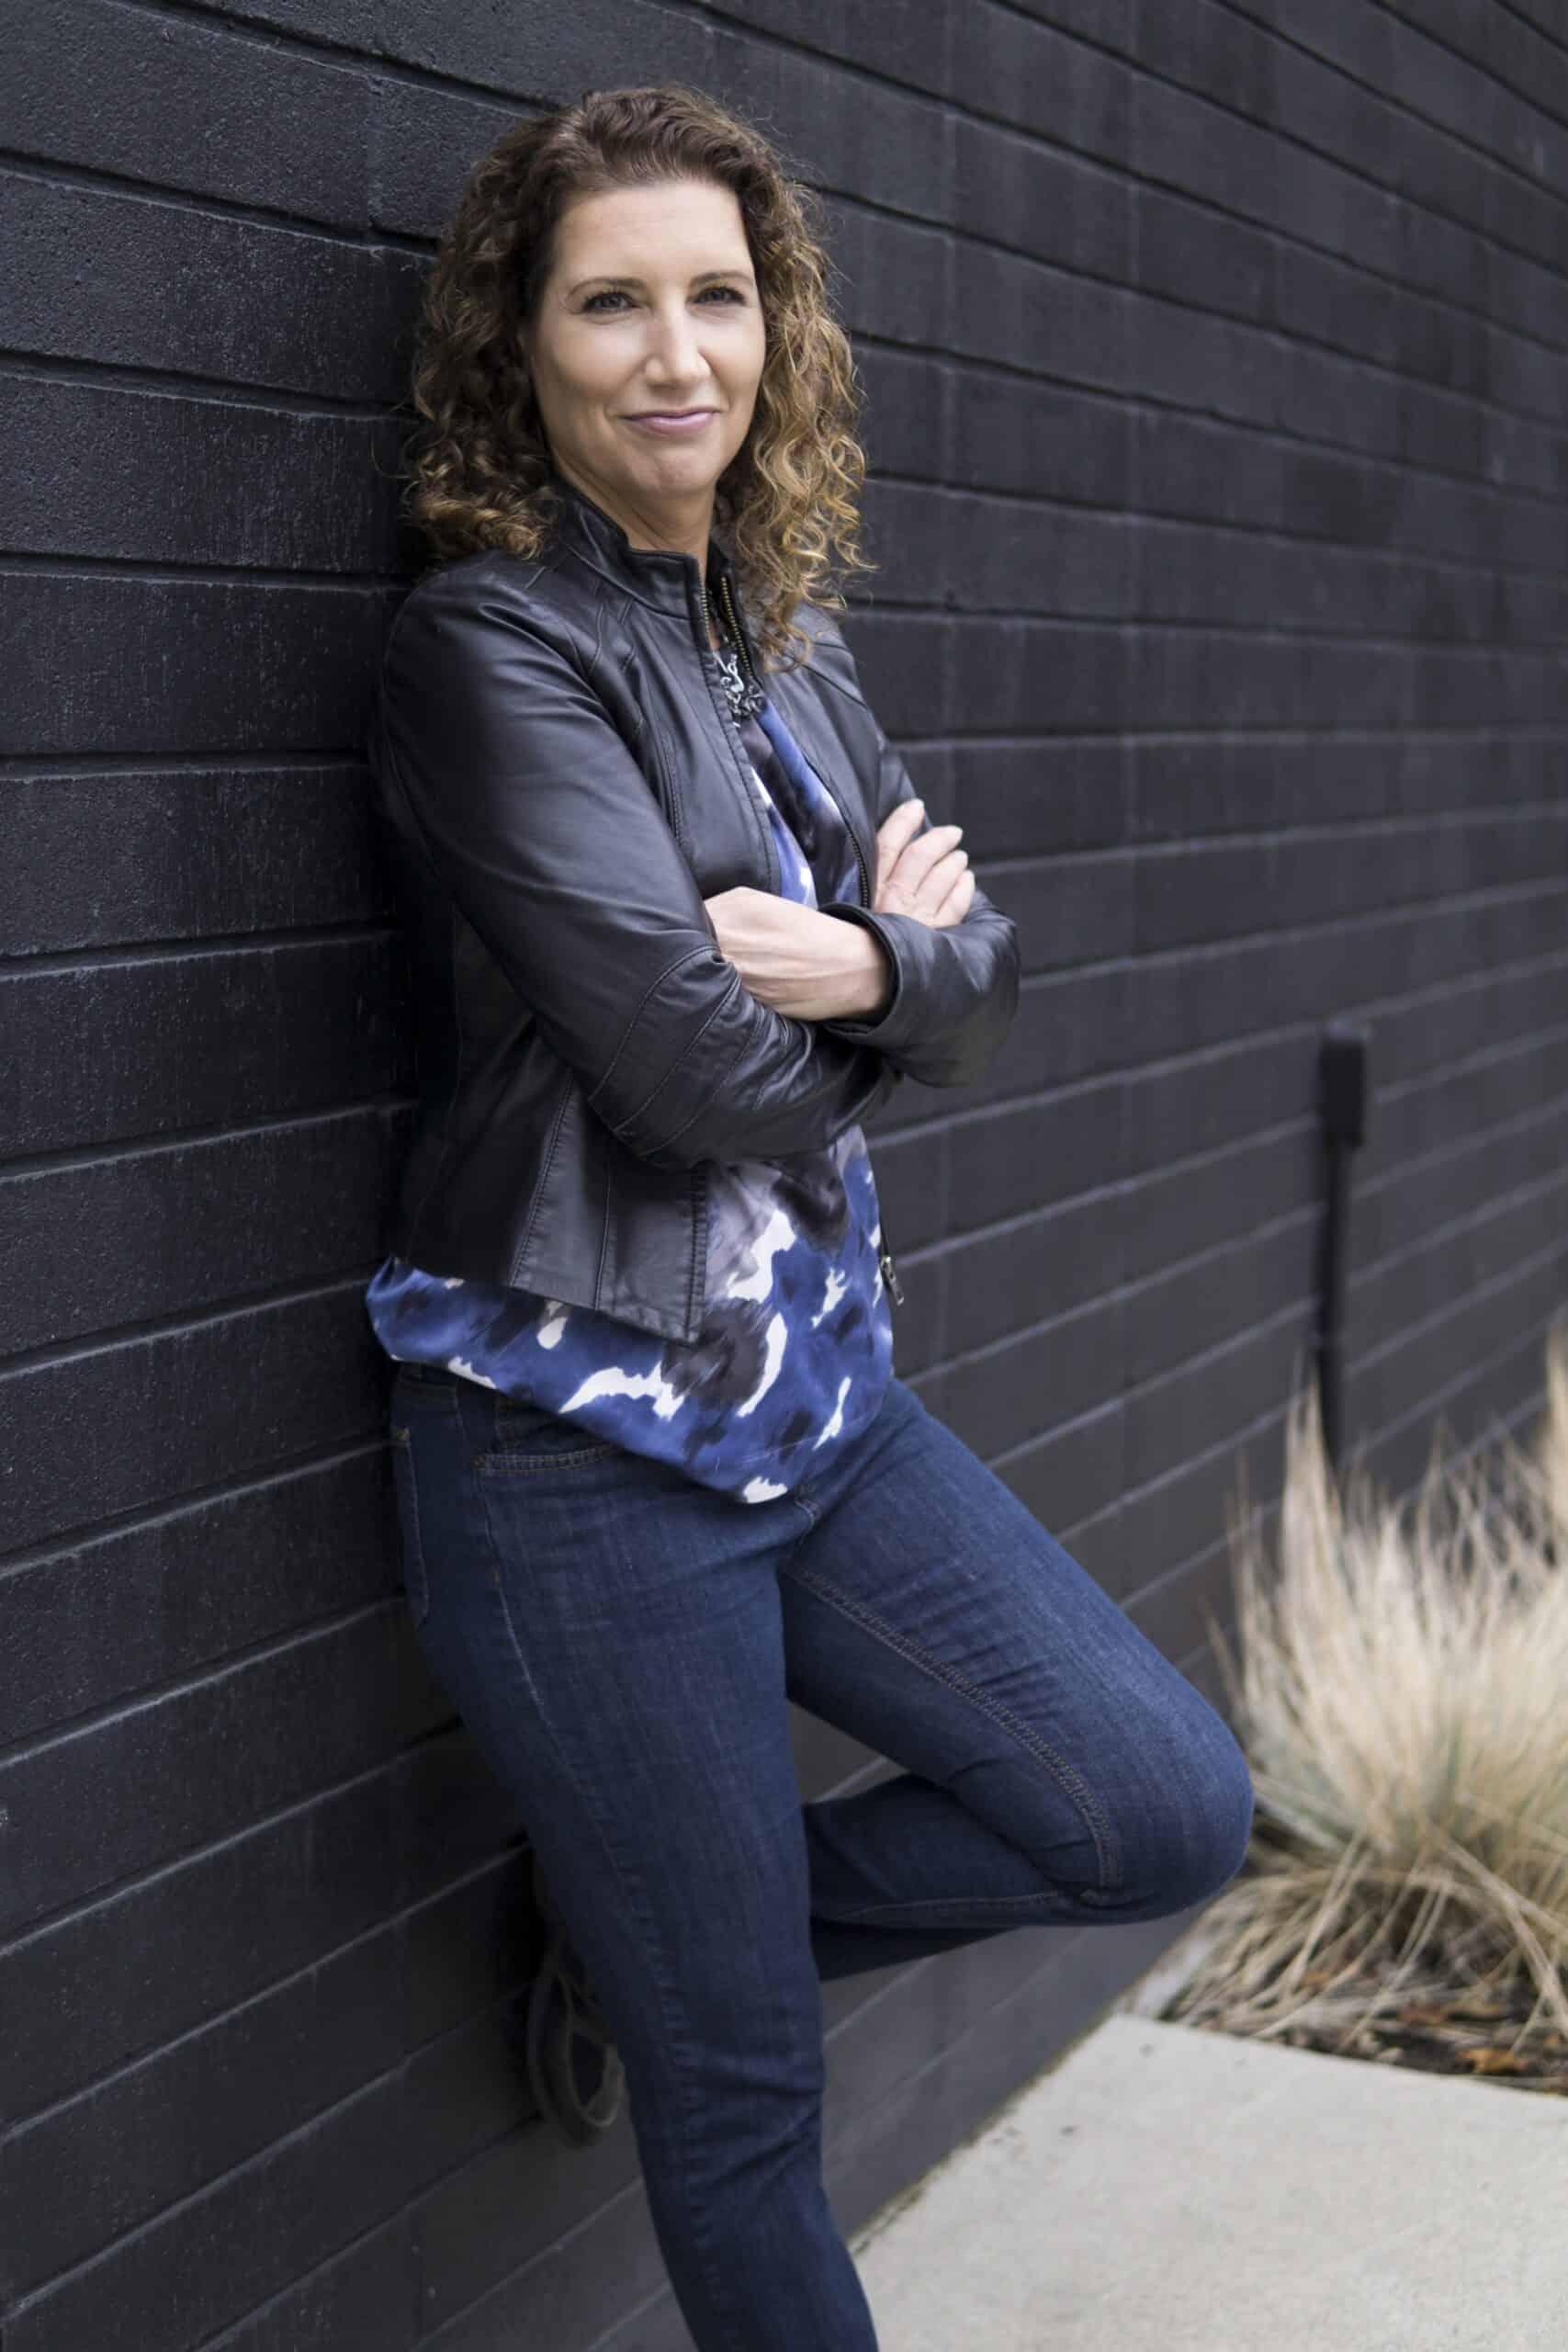 Suzy Dickstein profile Photo